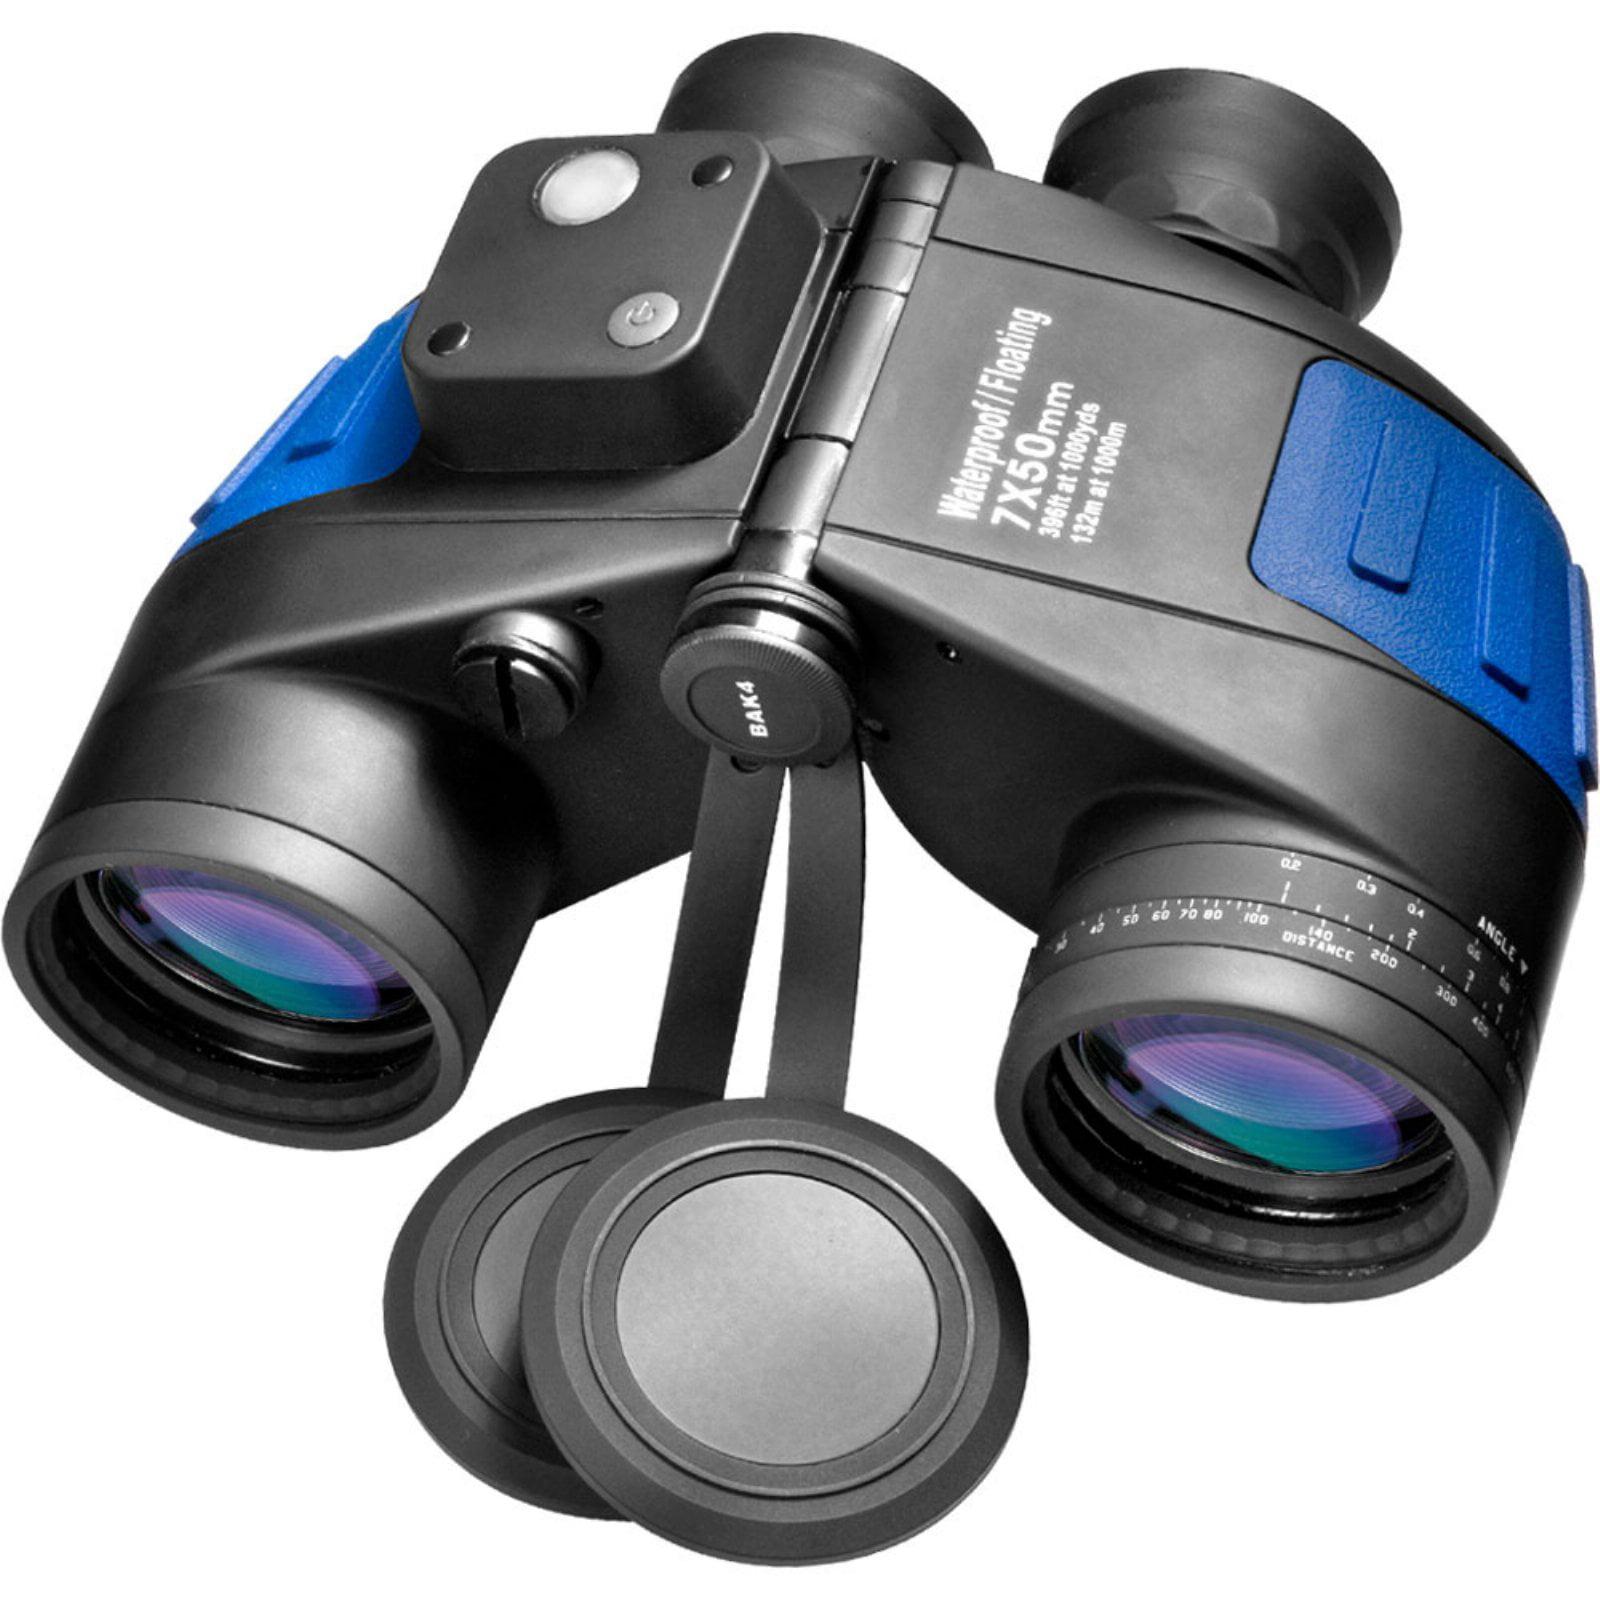 Barska 7x50mm Waterproof Floating Binocular with Compass and Rangefinder Reticle